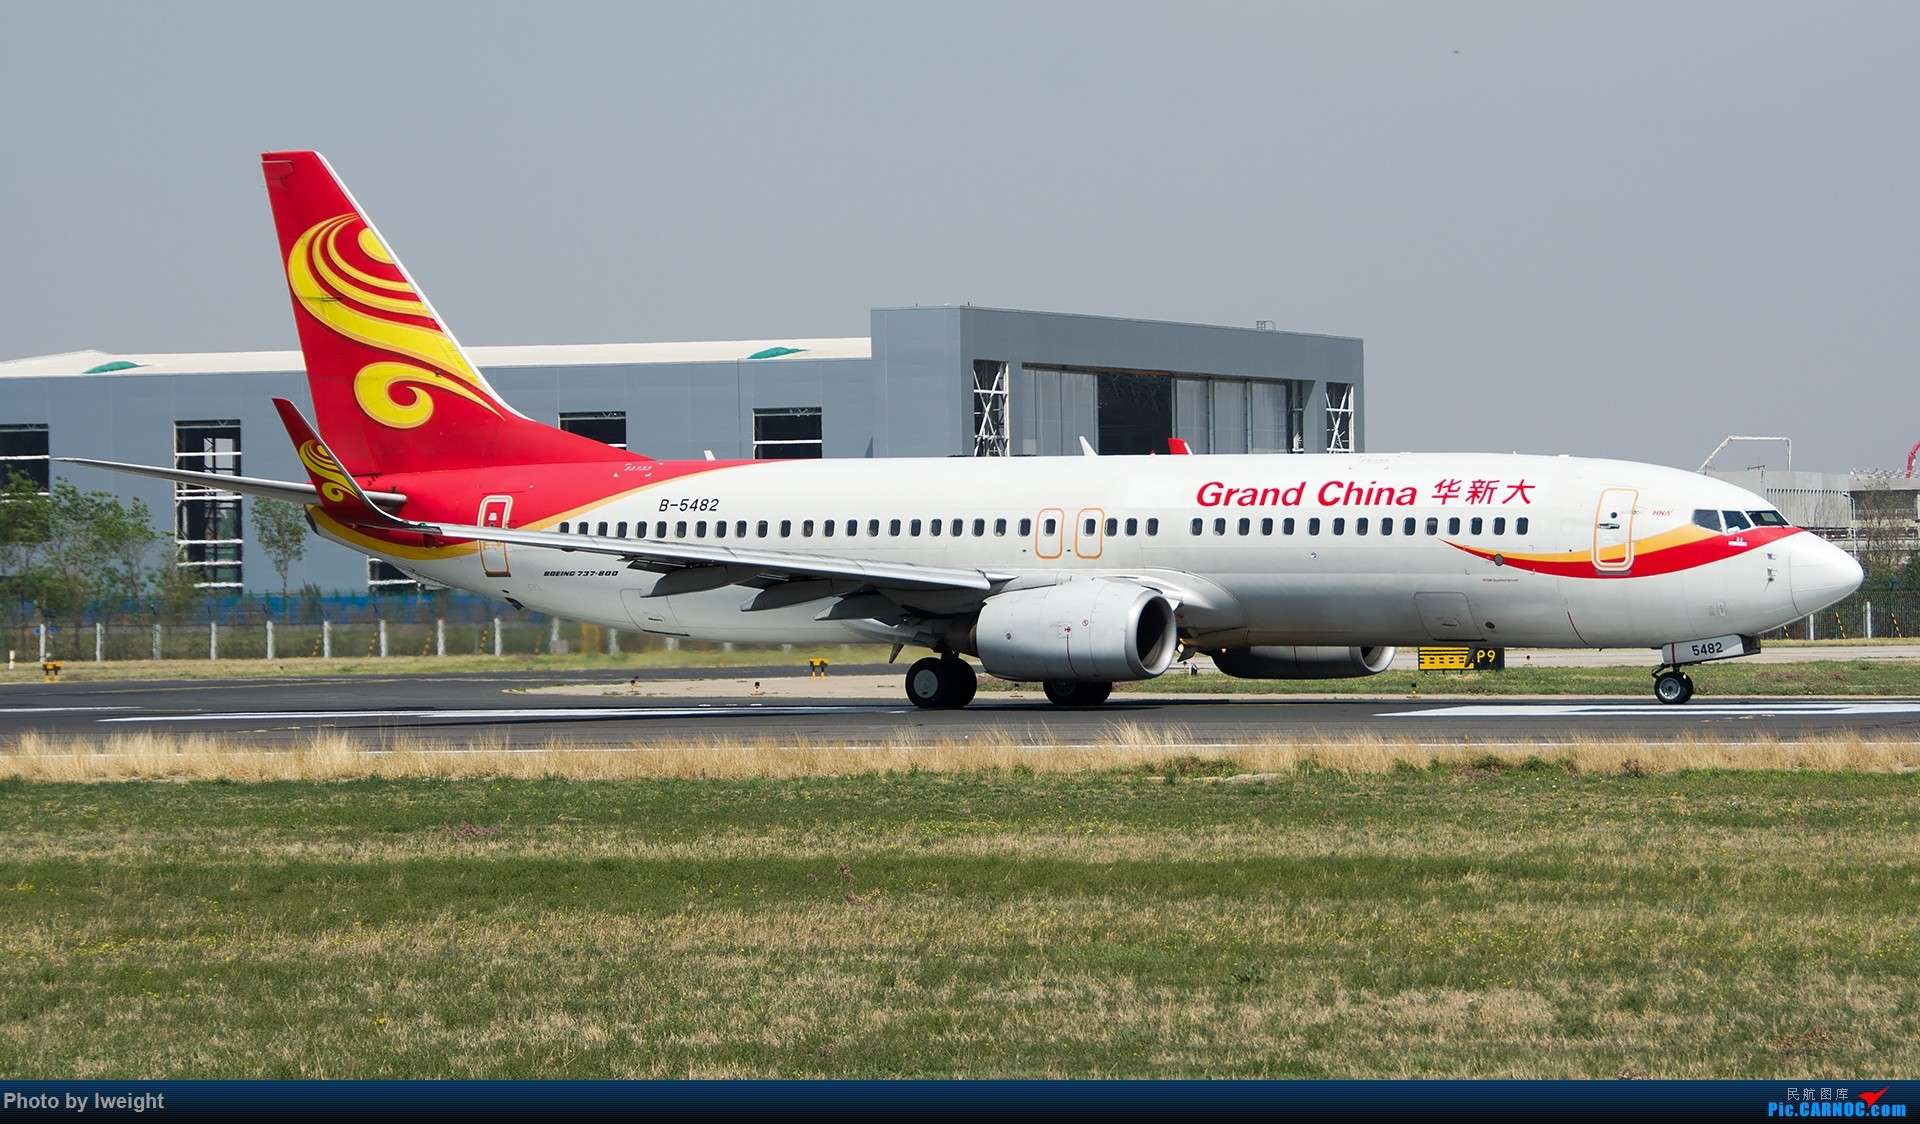 Re:[原创]2015年第一次在PEK拍北向南,其实是为Jimmy去的【2015-4-24】 BOEING 737-800 B-5482 中国北京首都国际机场